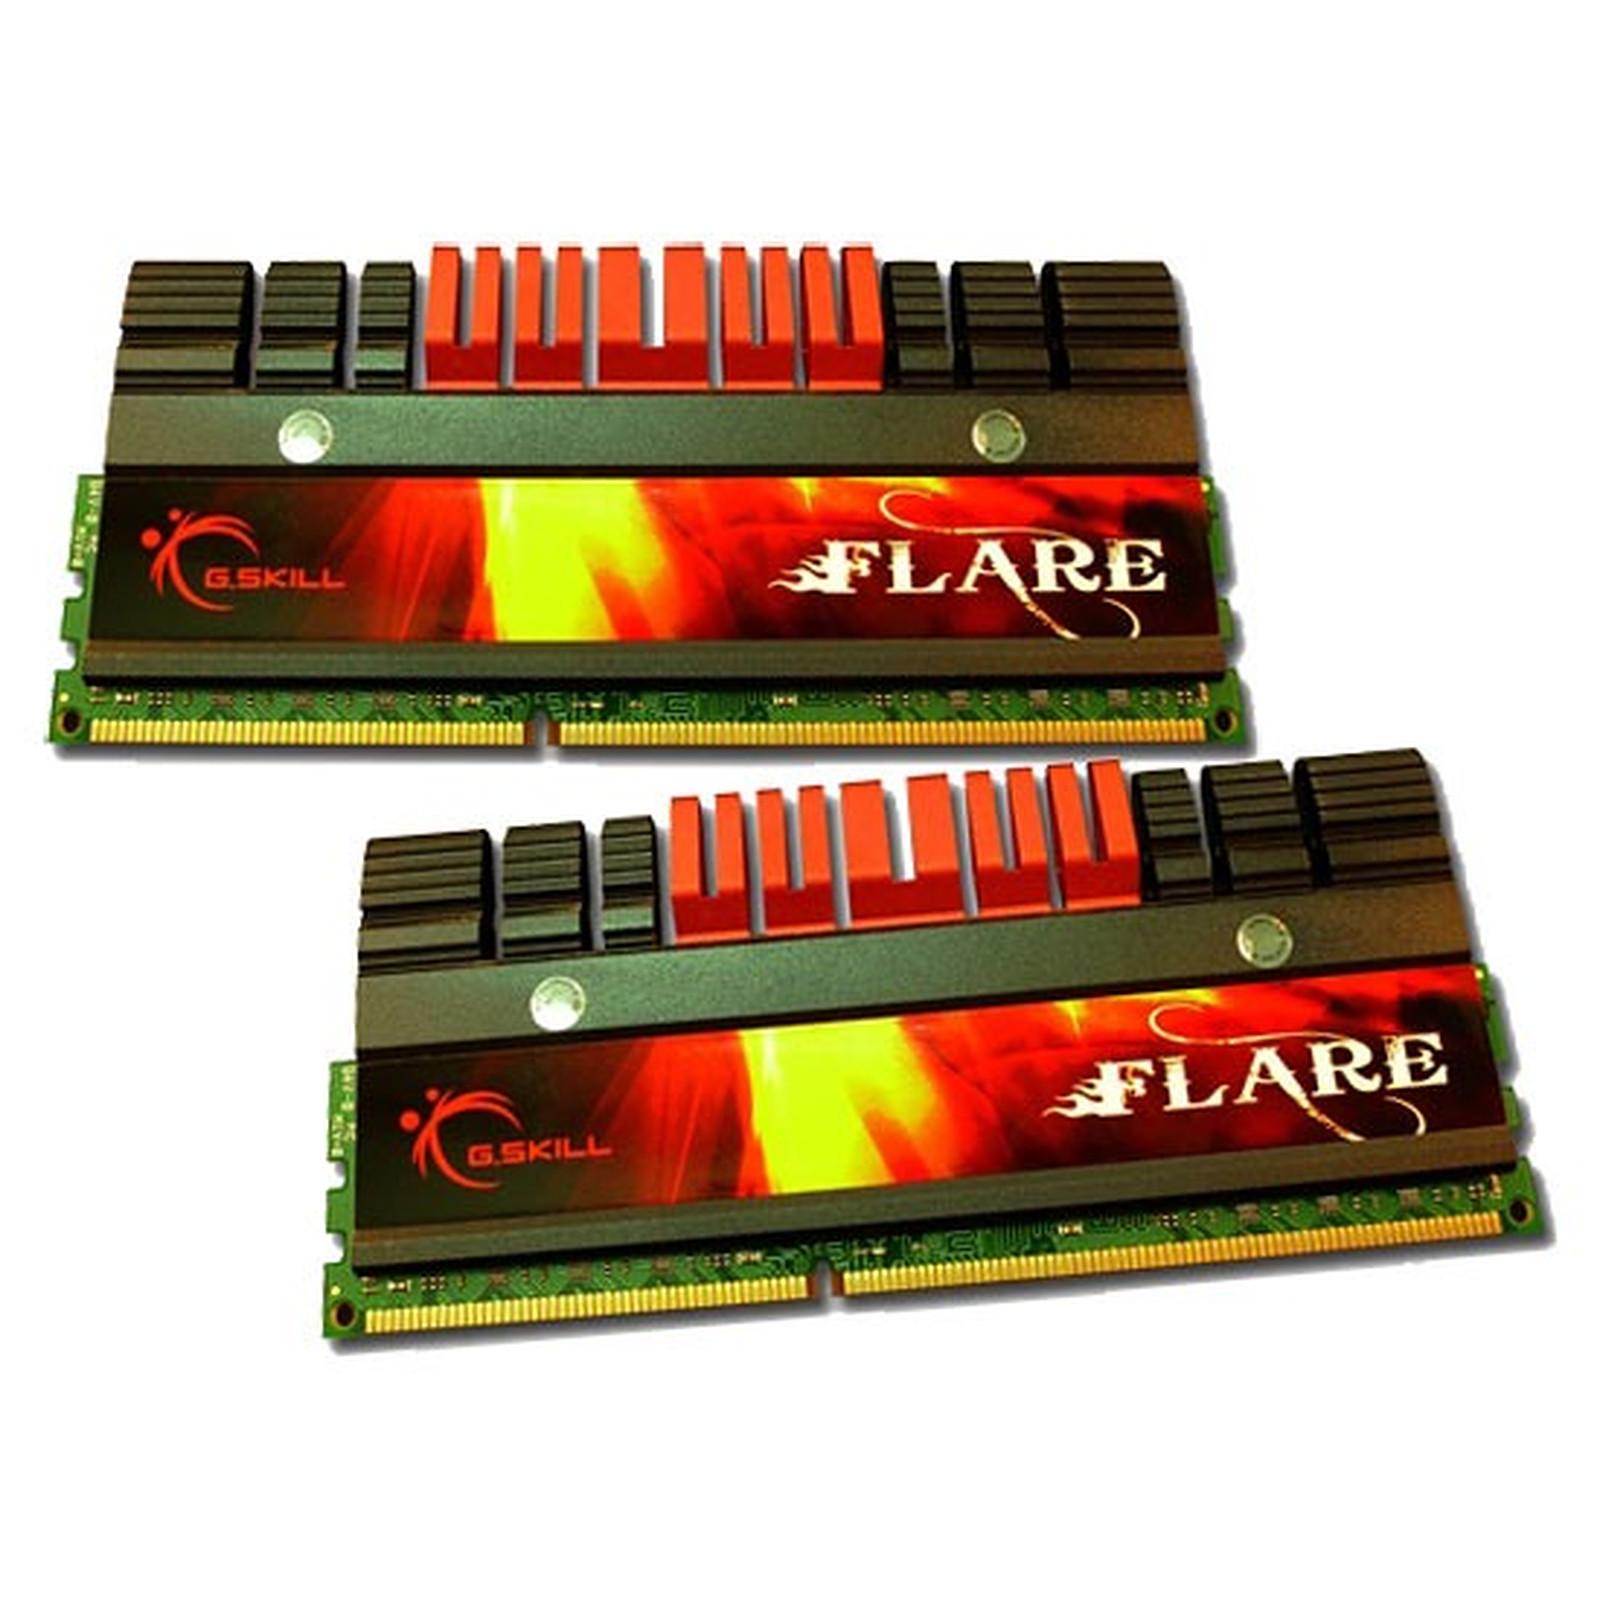 G.Skill FLARE Series 4 Go (2x 2Go) DDR3 2000 MHz